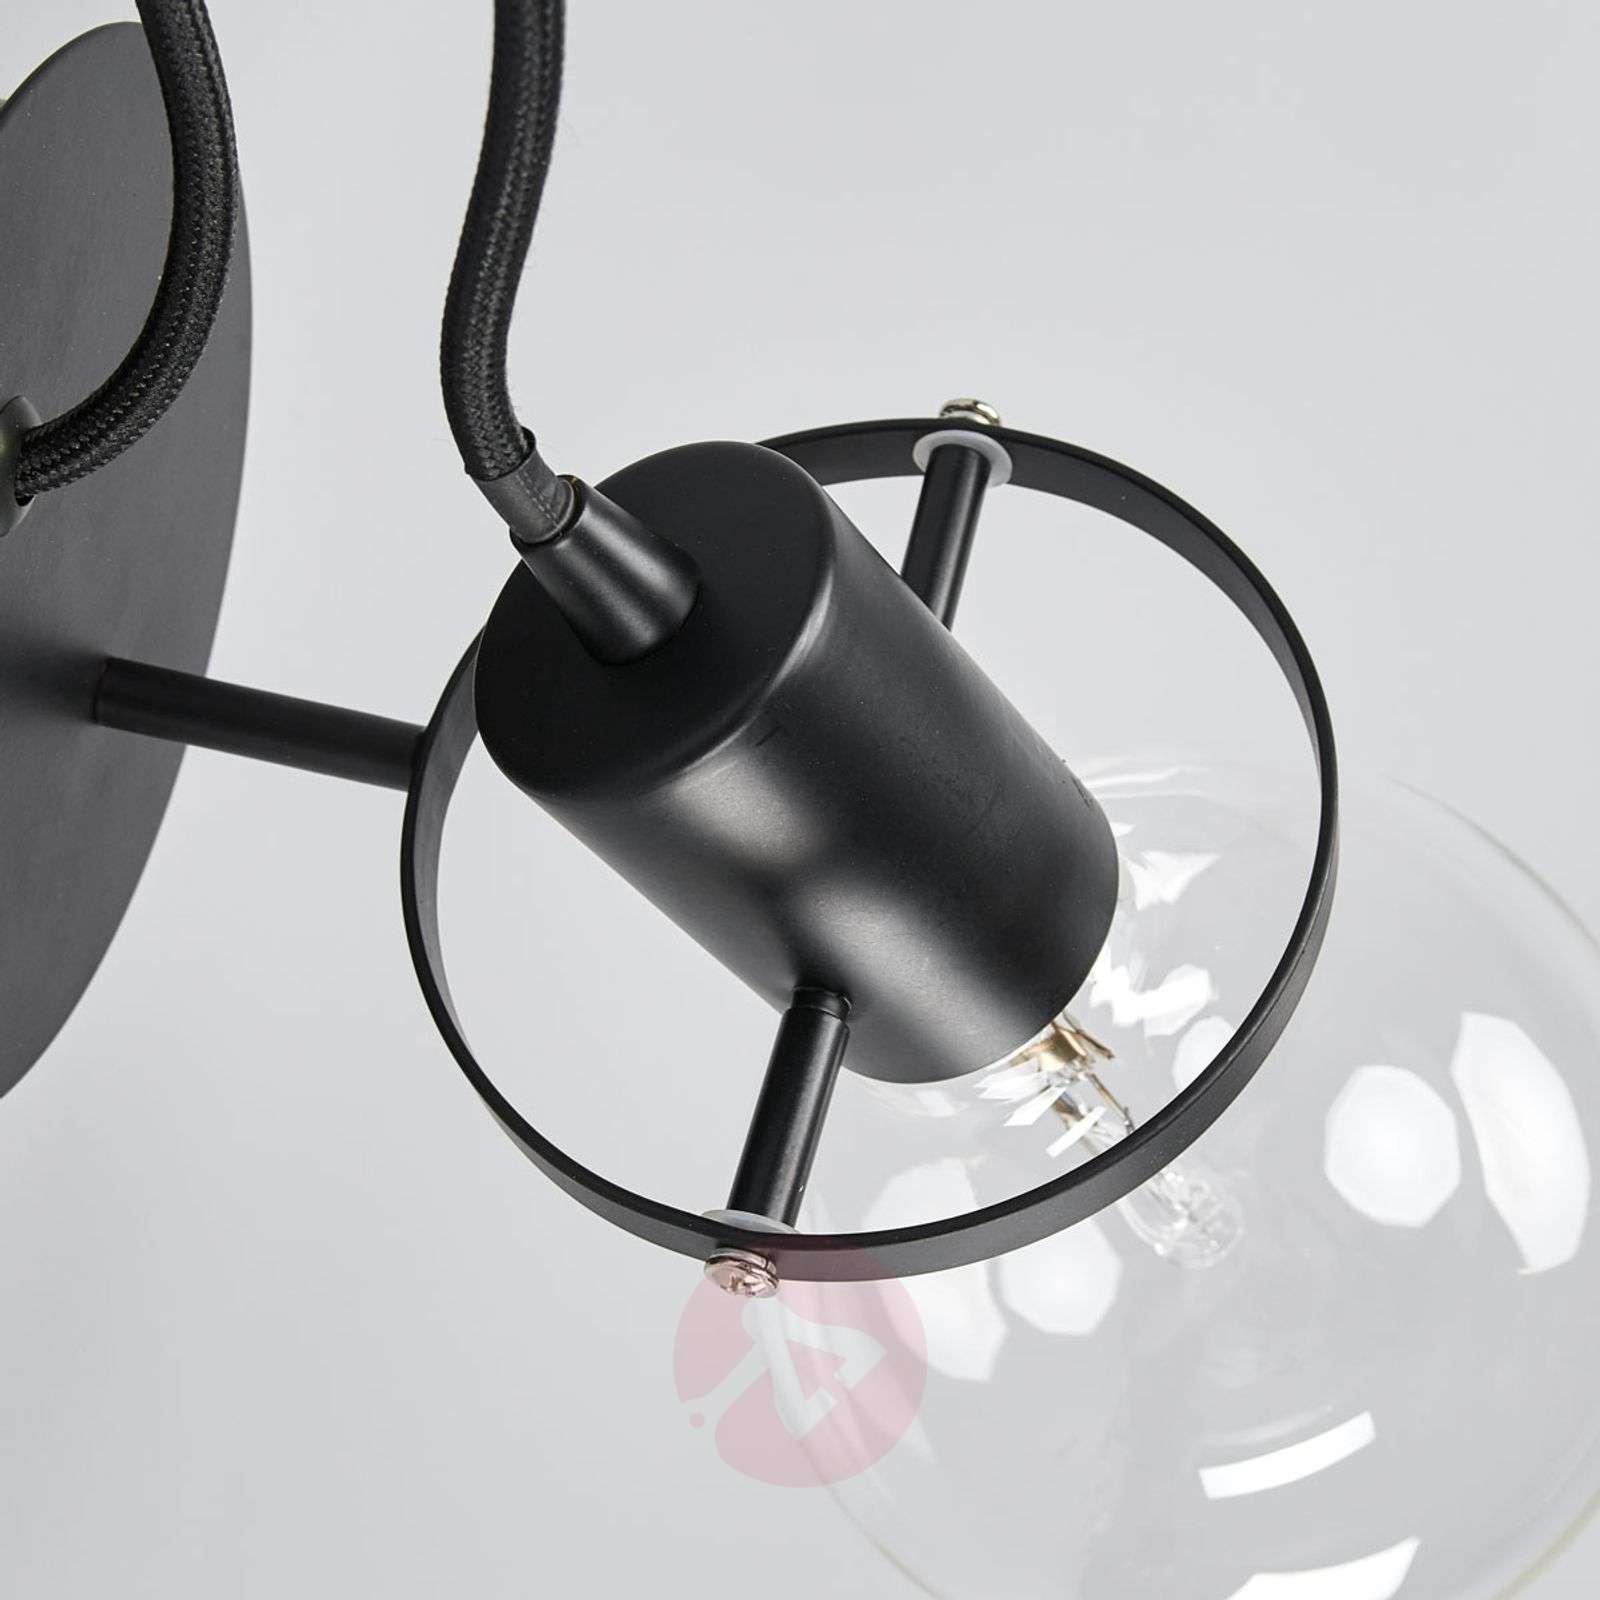 Moderni design-seinälamppu Radio-5001693-01